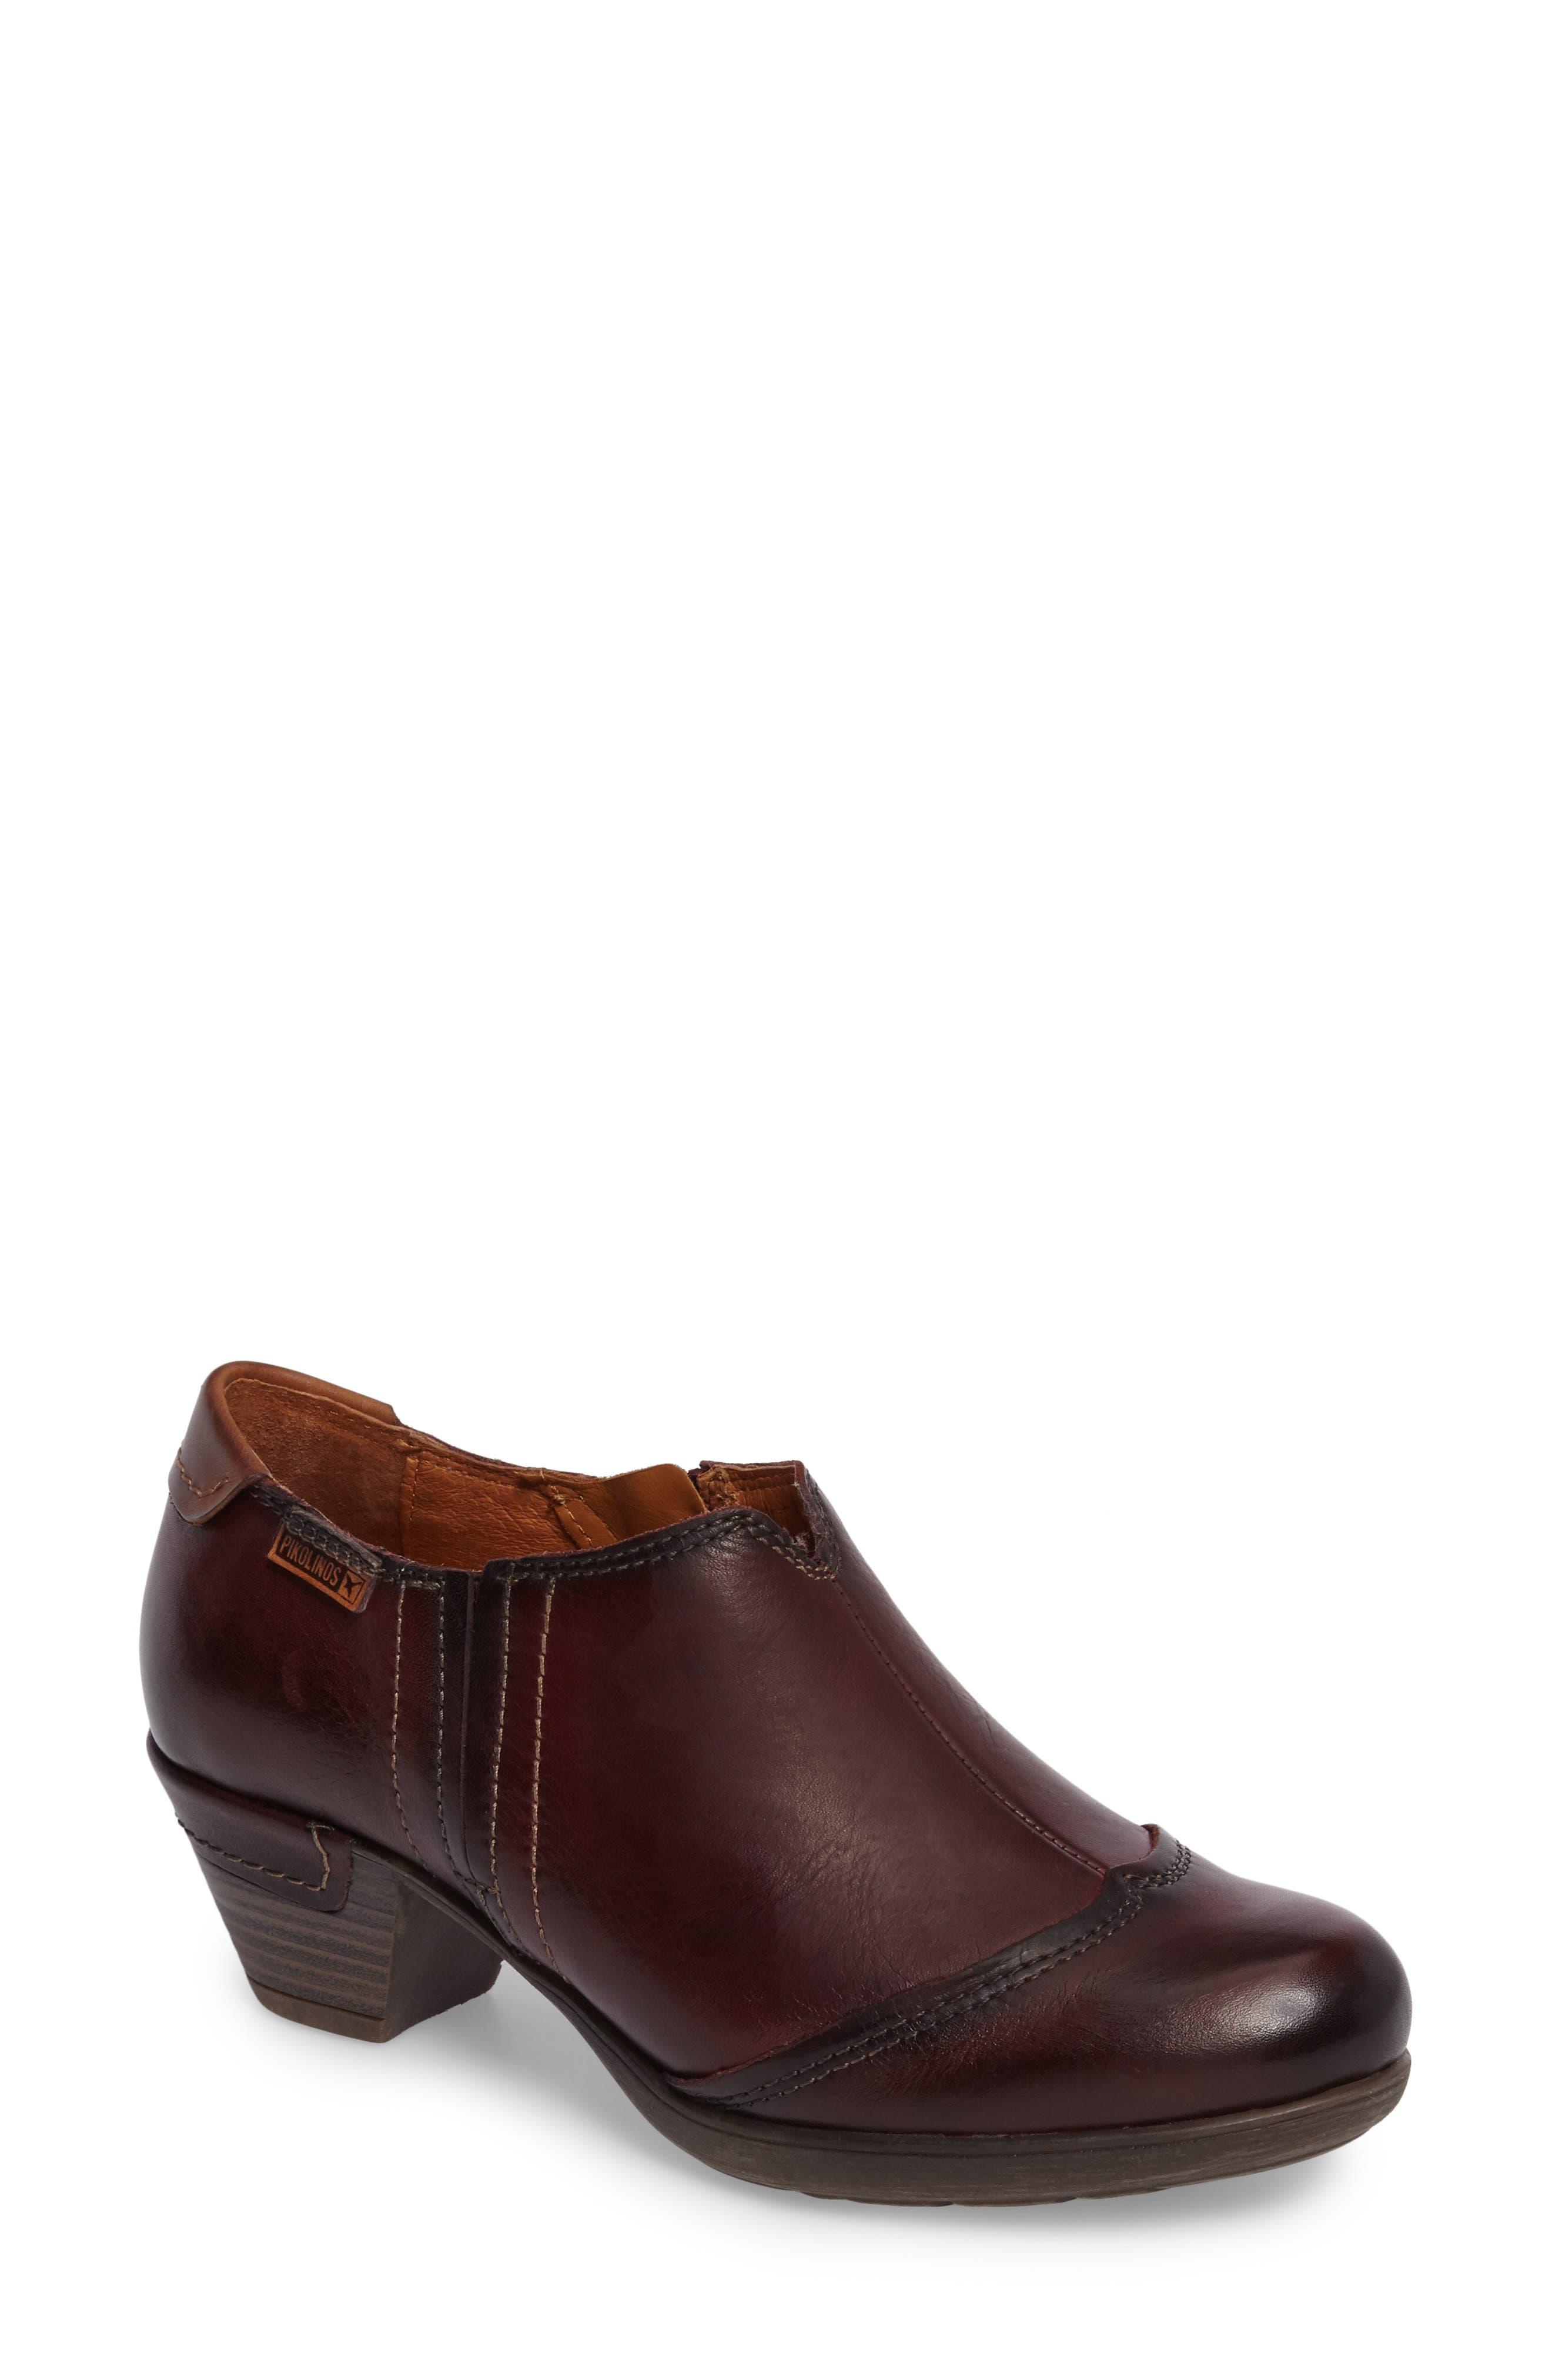 Rotterdam Bootie,                         Main,                         color, Garnet Cuero Leather